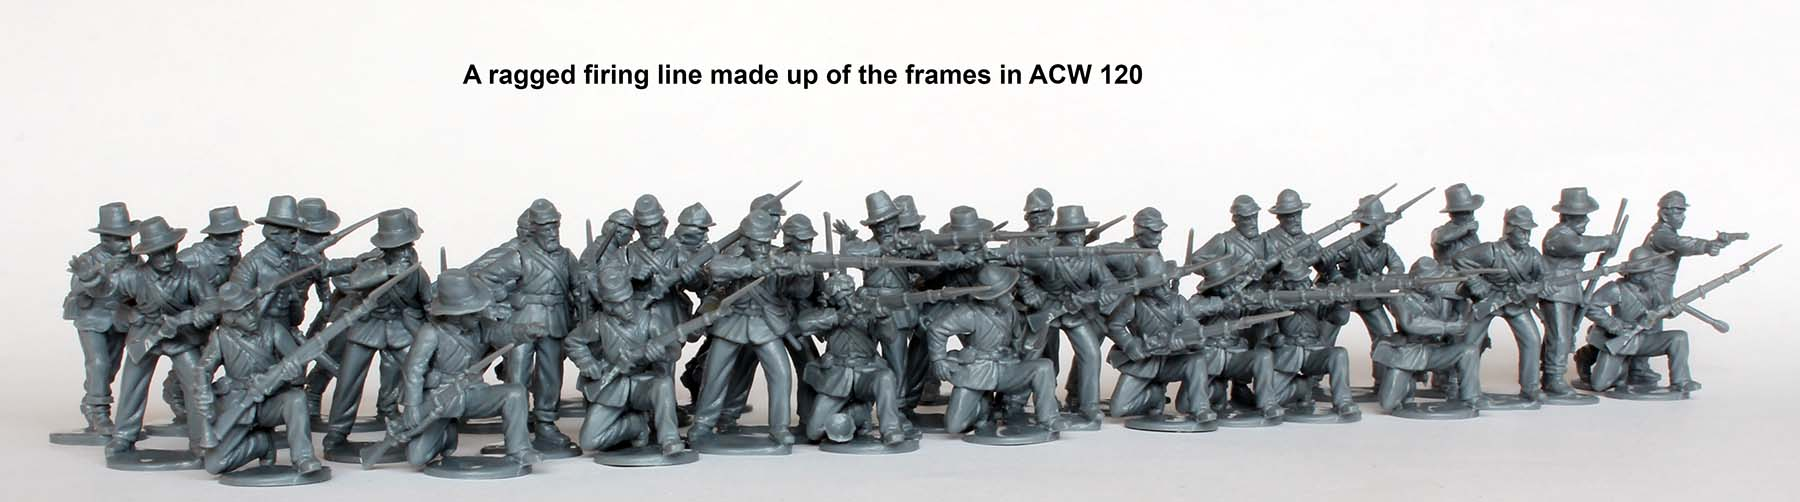 ragged-firing-line_american-civil-war-union-infantry-in-sack-coats-skirmishing-1861-65